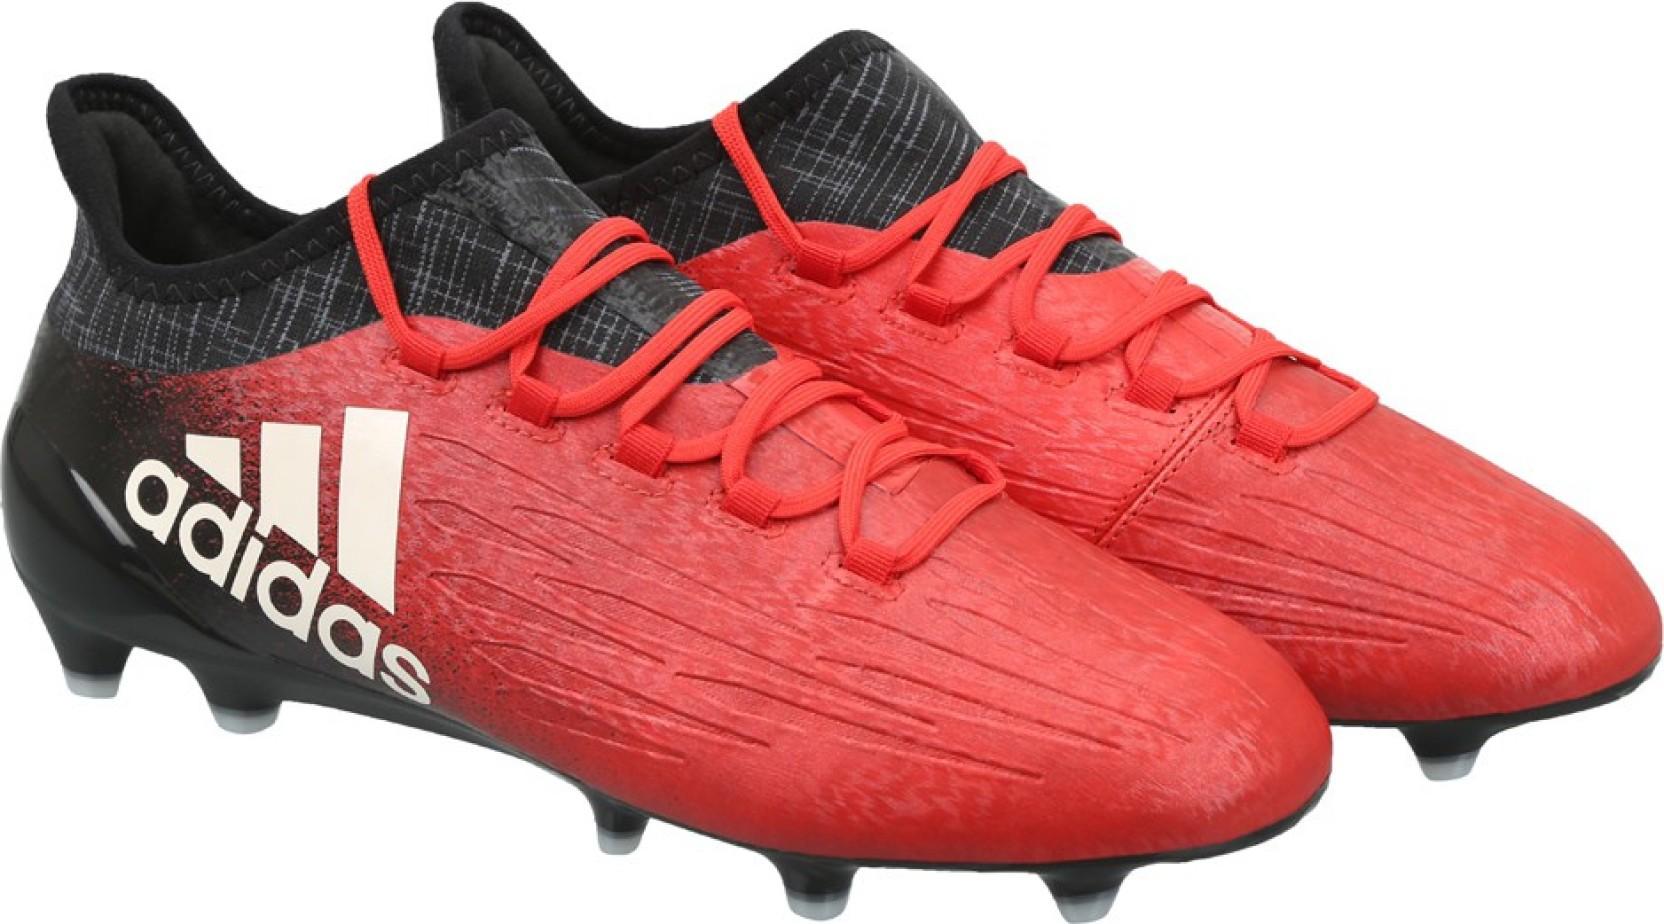 b0dfe03bd62 ADIDAS X 16.1 FG Football Shoes For Men - Buy RED FTWWHT CBLACK ...